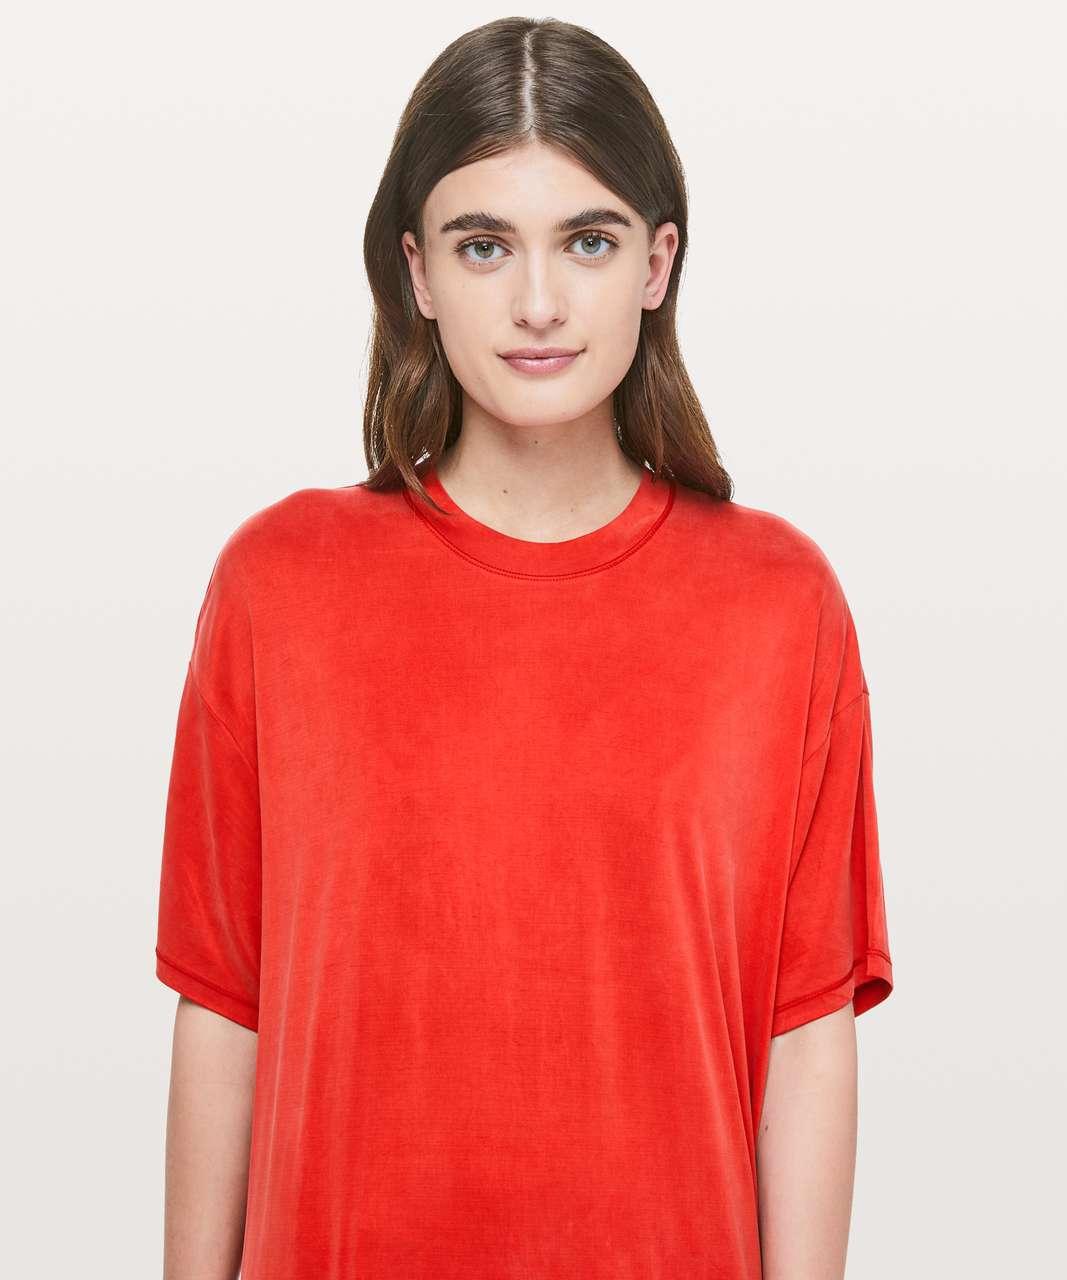 Lululemon Sumu-Su Dress - Fiery Red